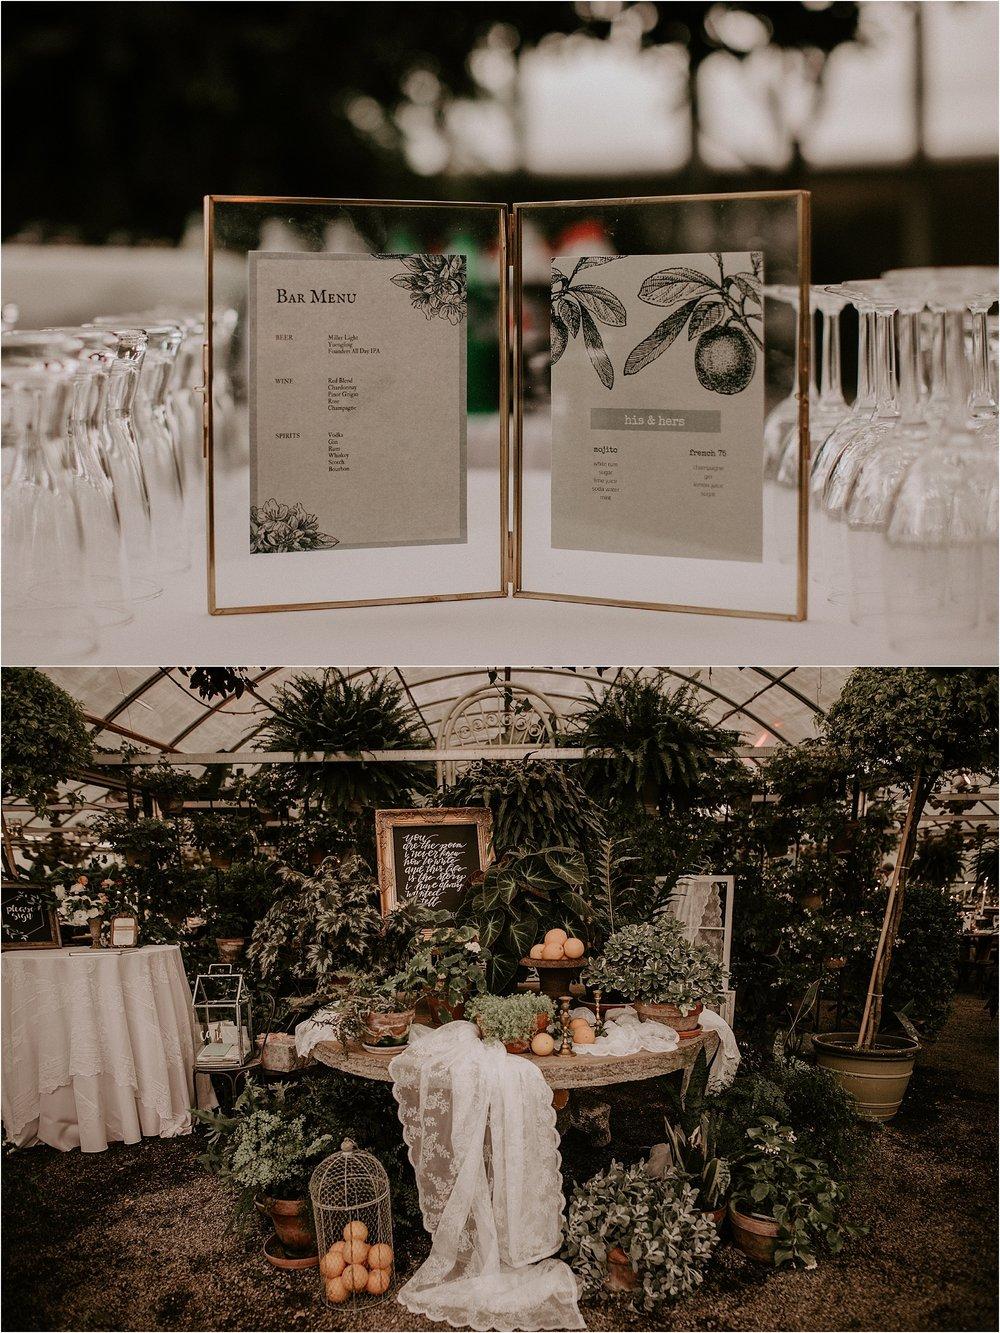 Sarah_Brookhart_Hortulus_Farm_Garden_and_Nursey_Wedding_Photographer_0063.jpg